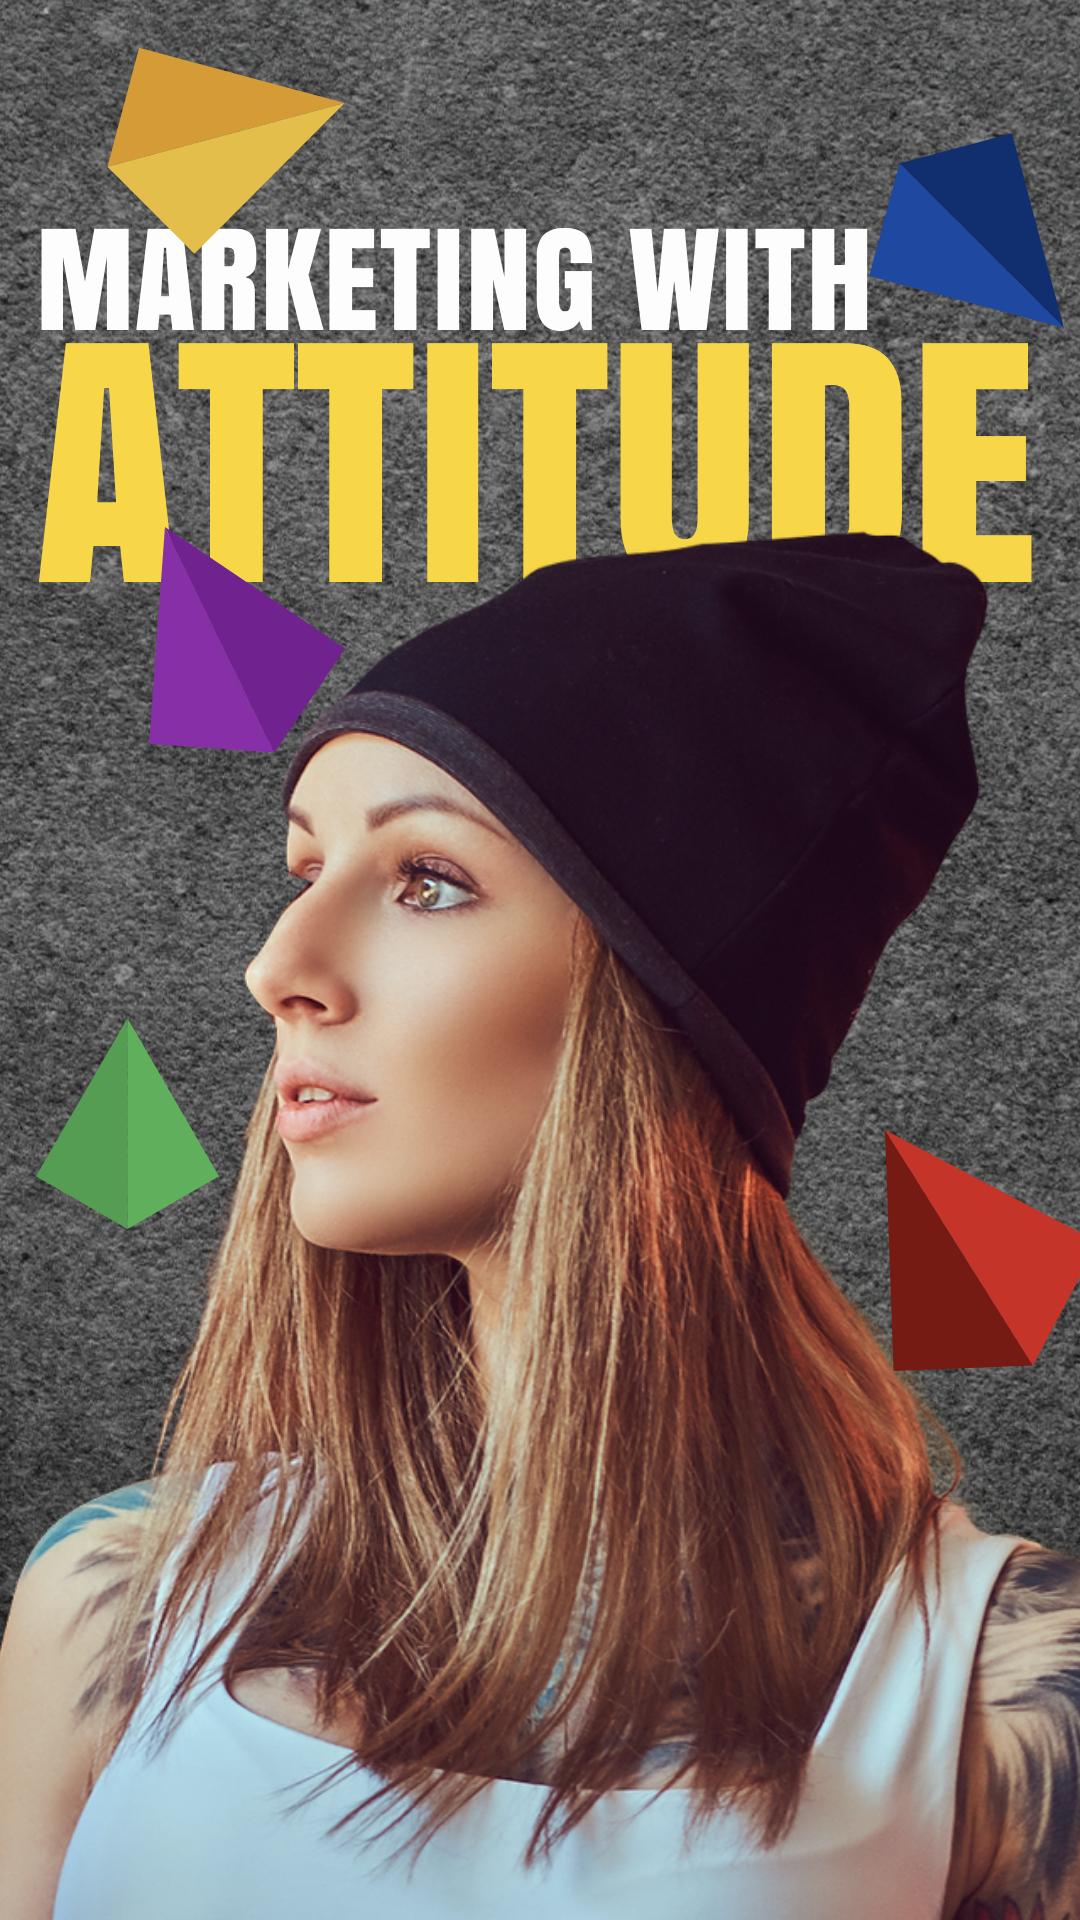 Marketing With Attitude